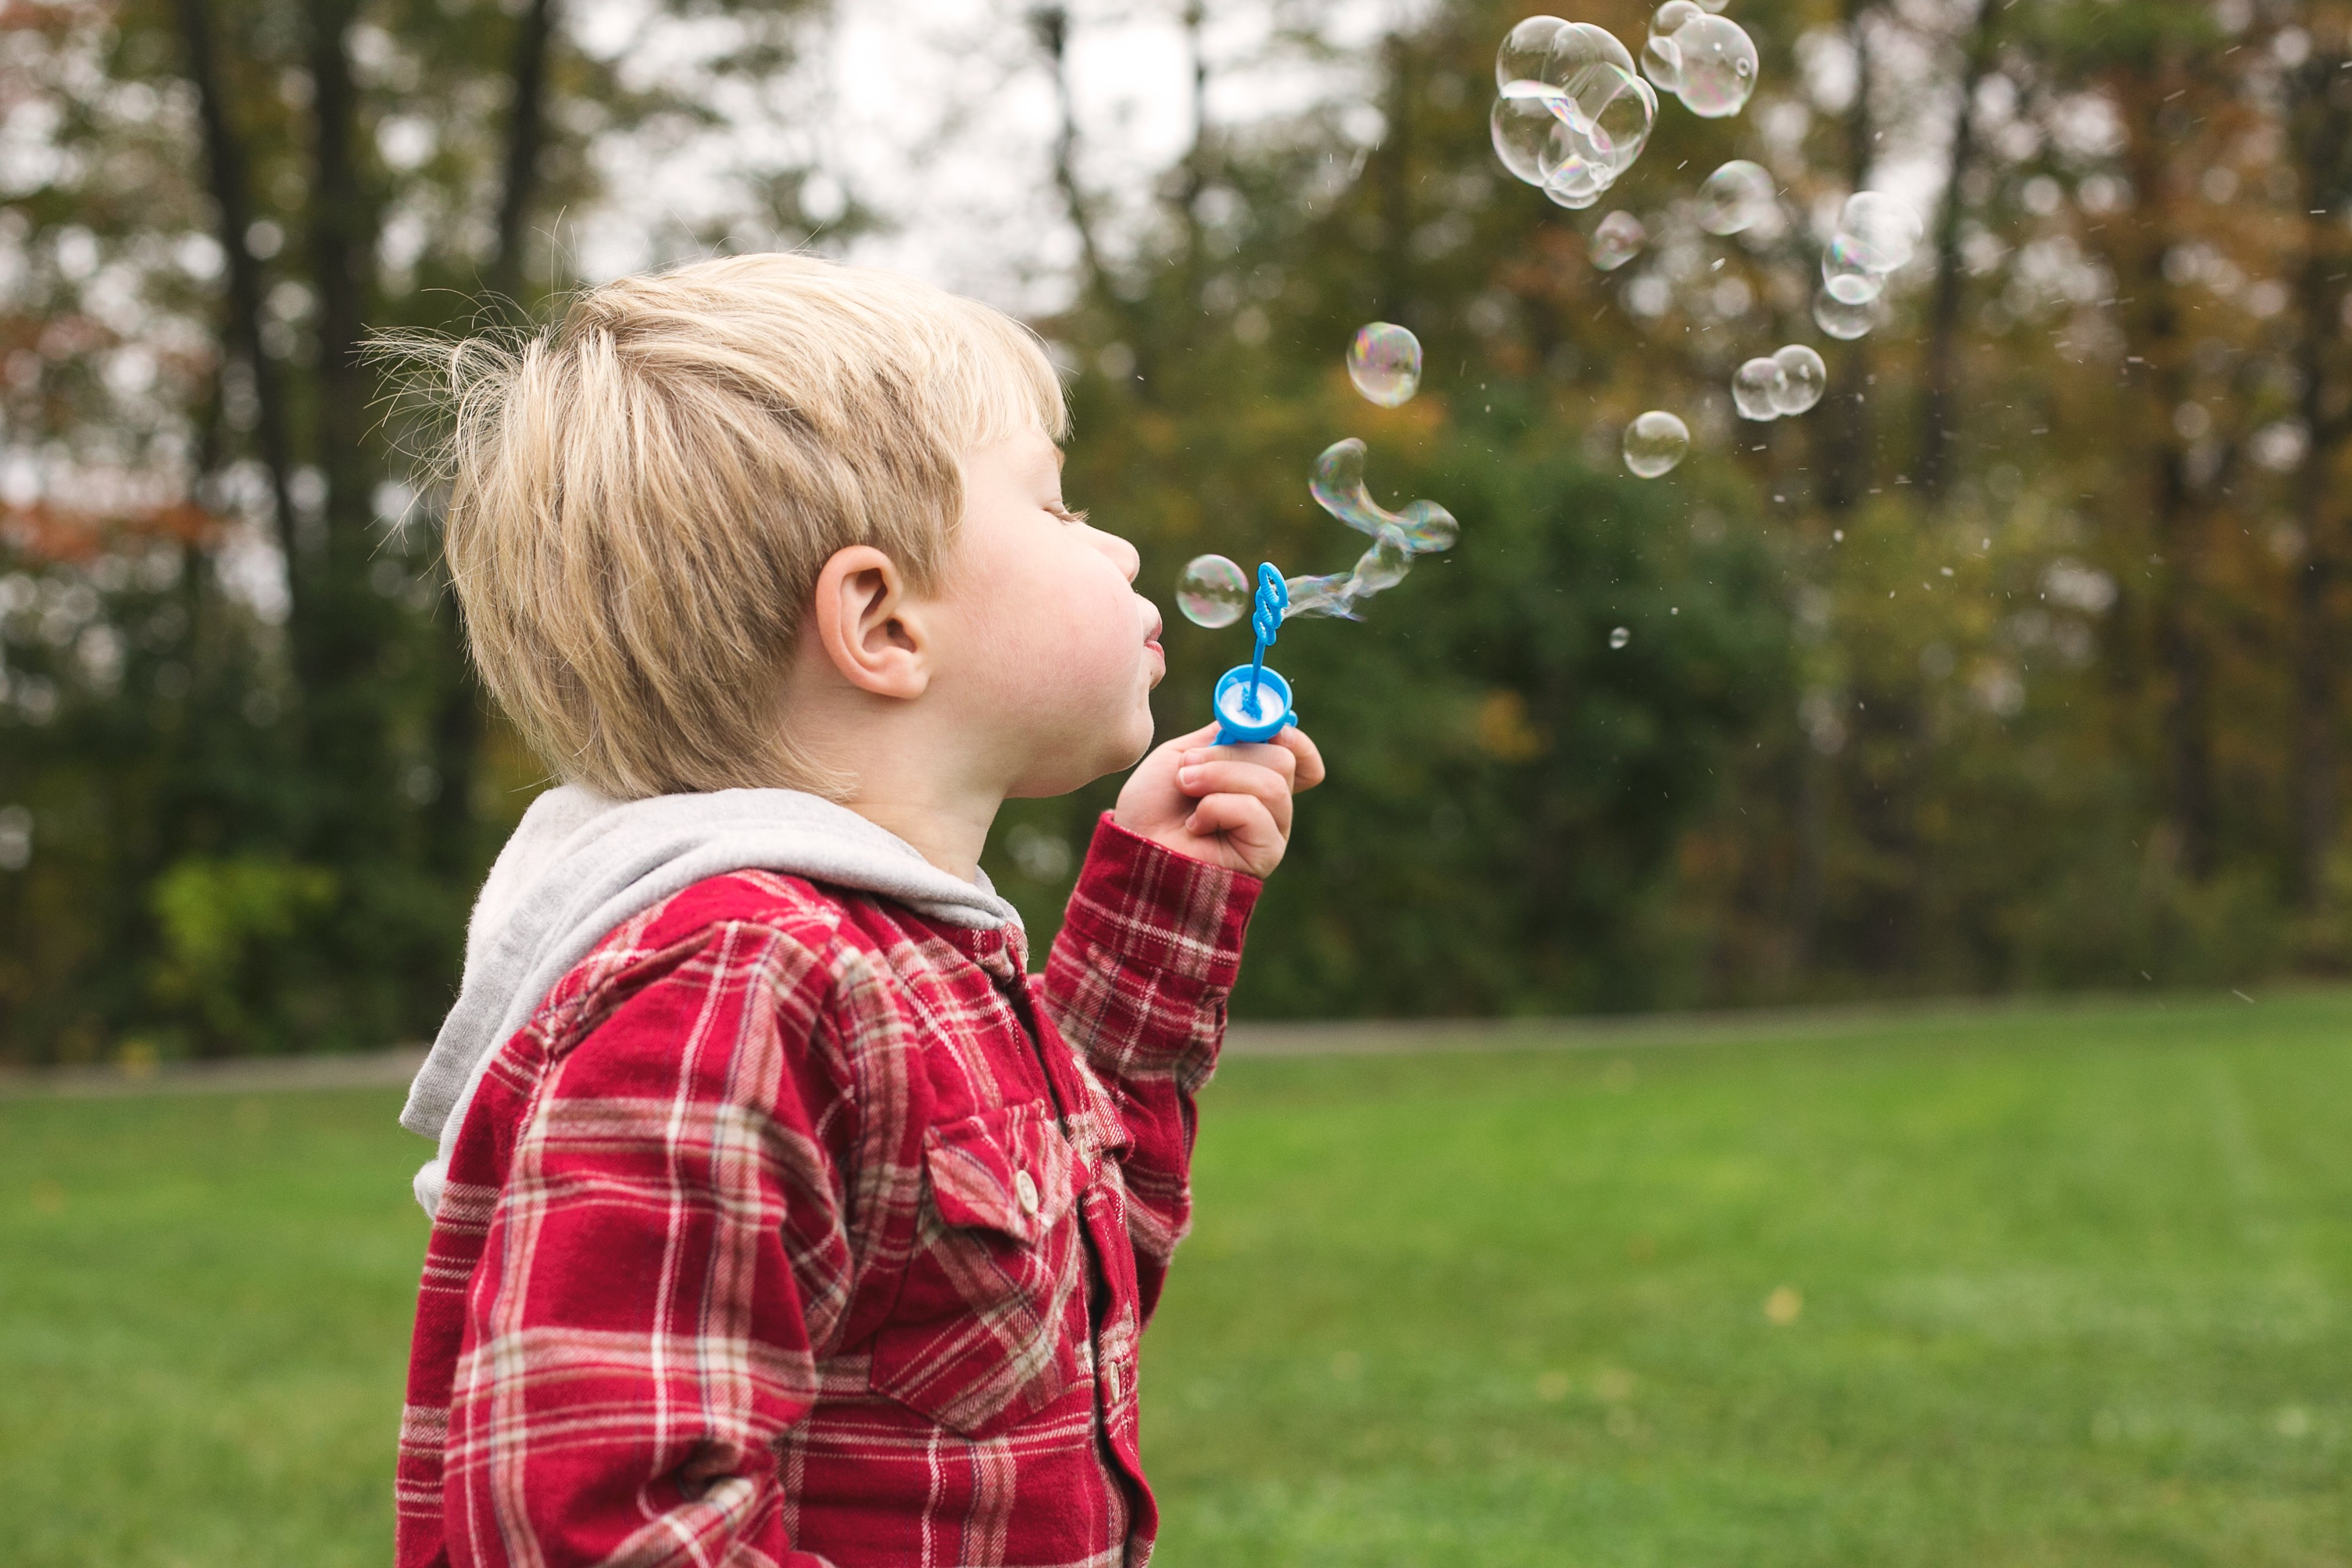 boy-blowing-bubbles